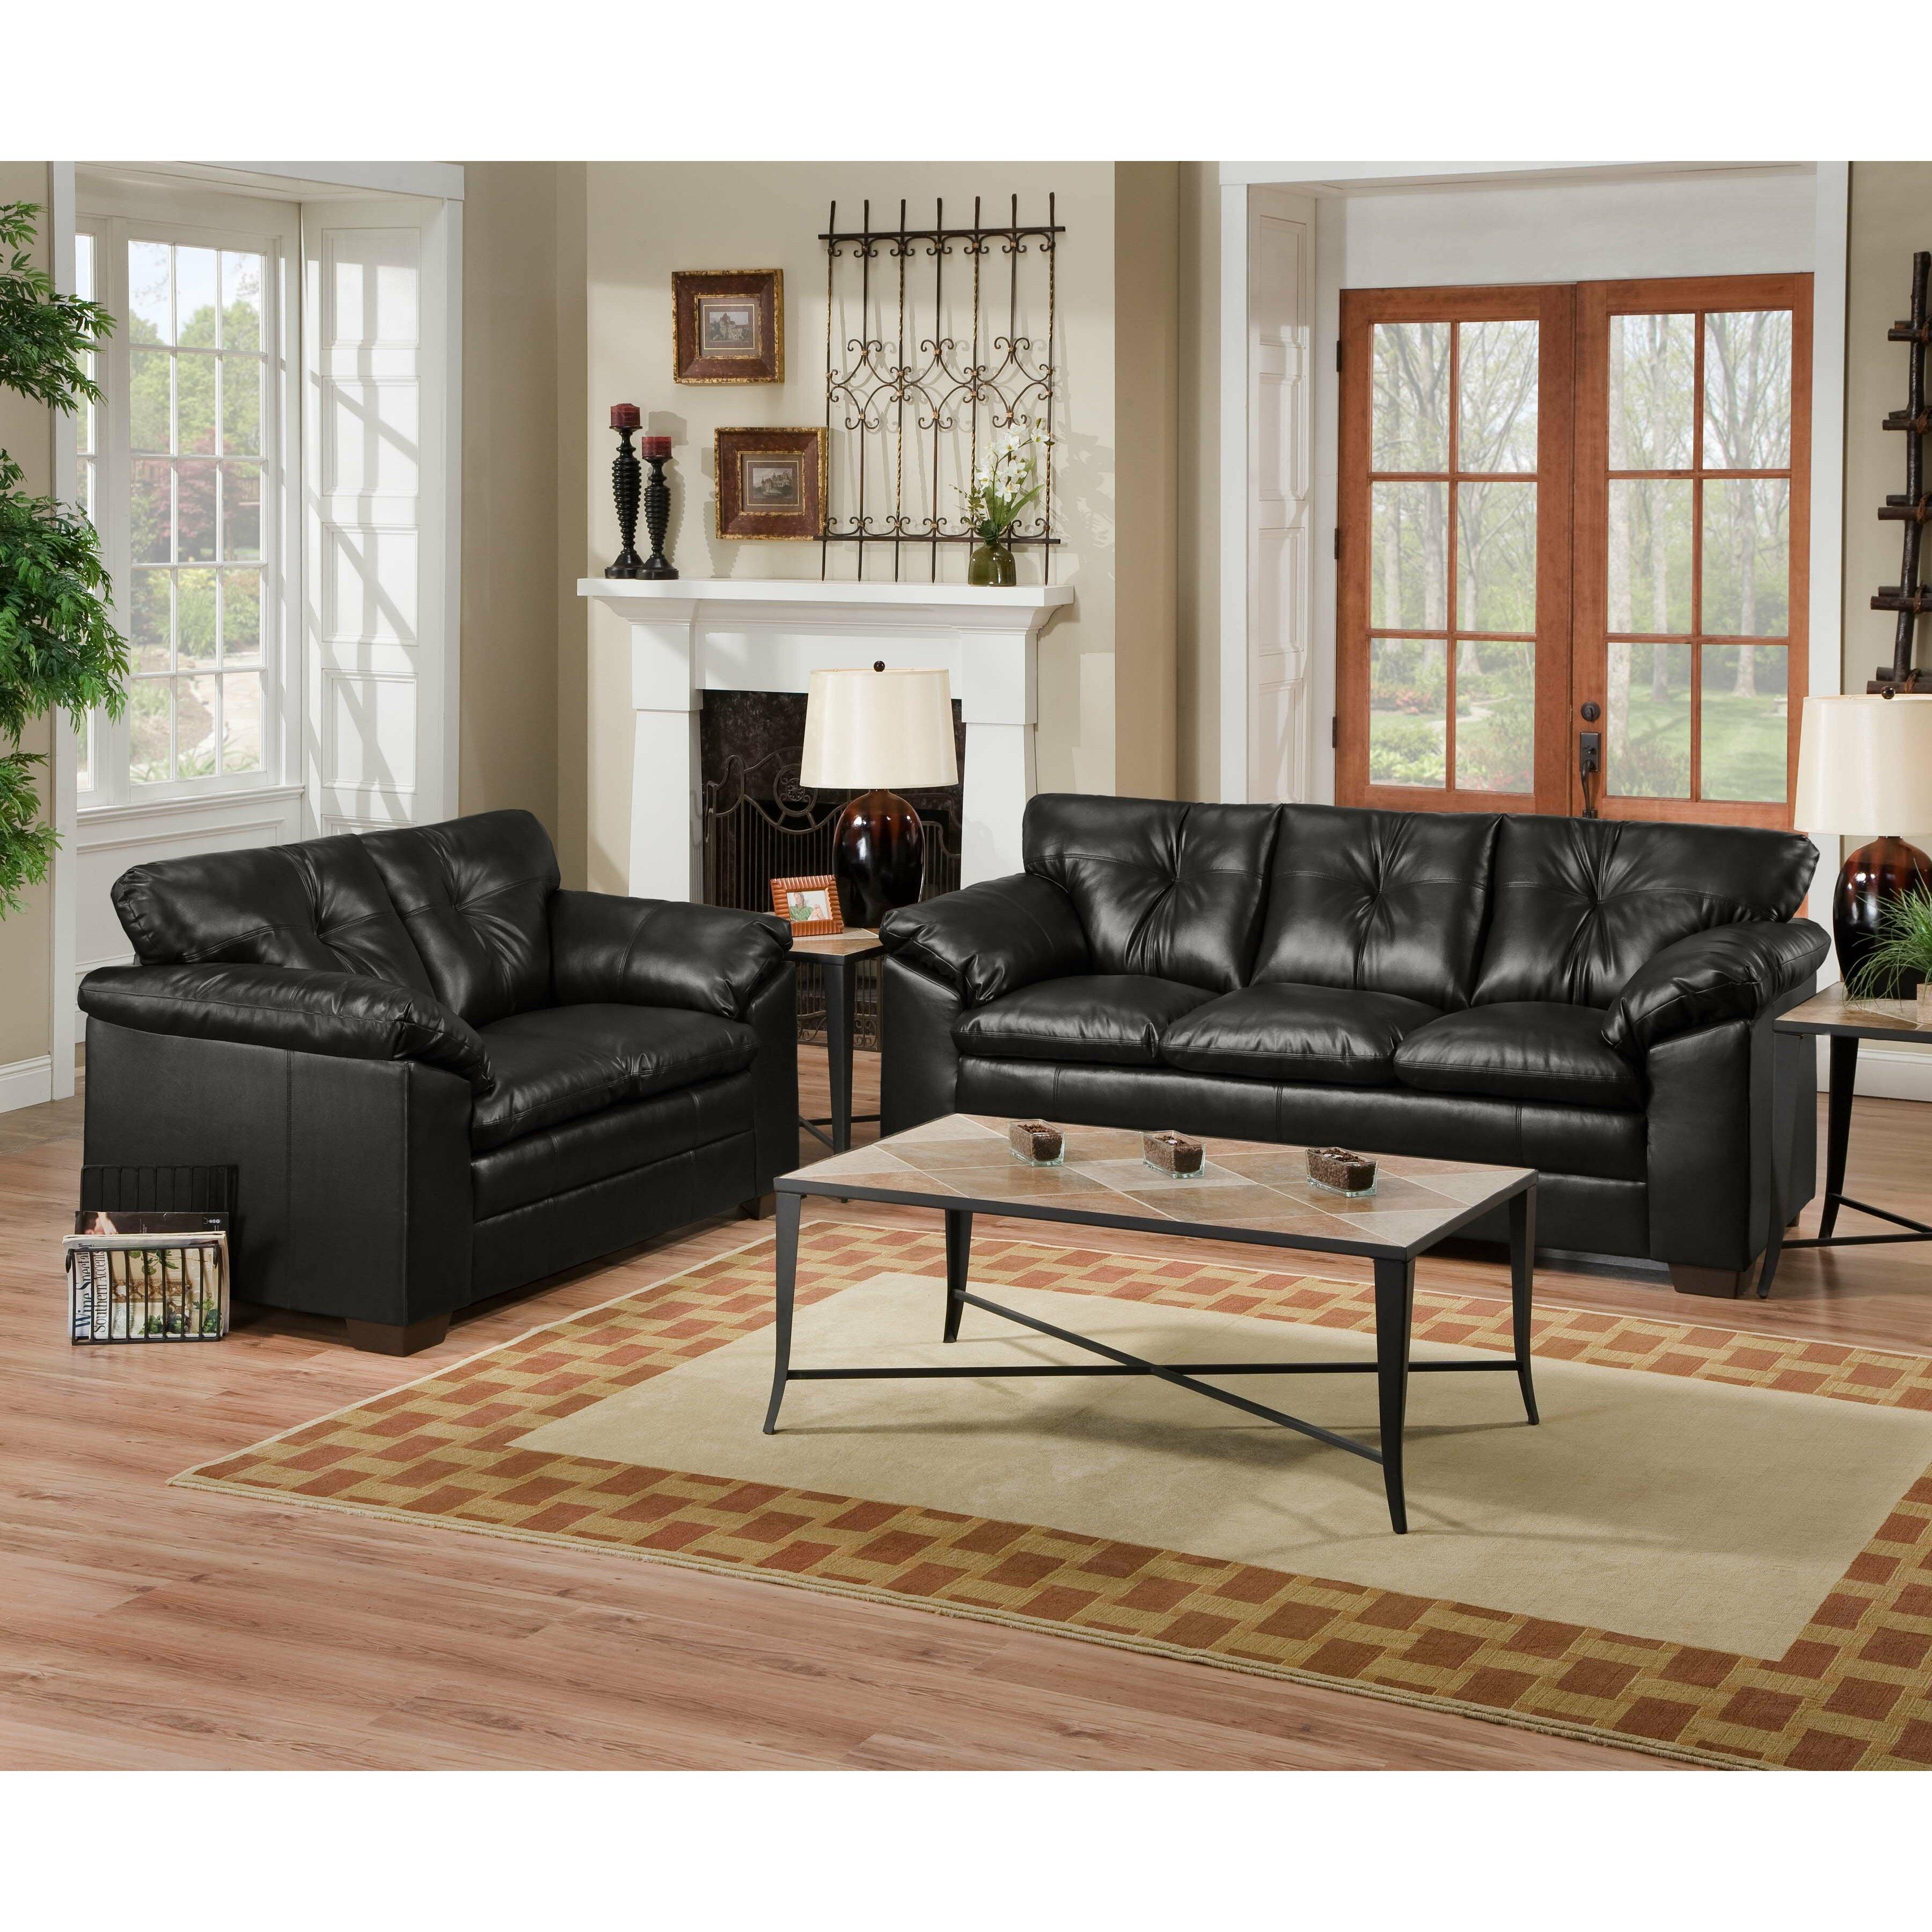 Wayfair Living Room Furniture Simmons Upholstery Duxbury Living Room Collection Reviews Wayfair